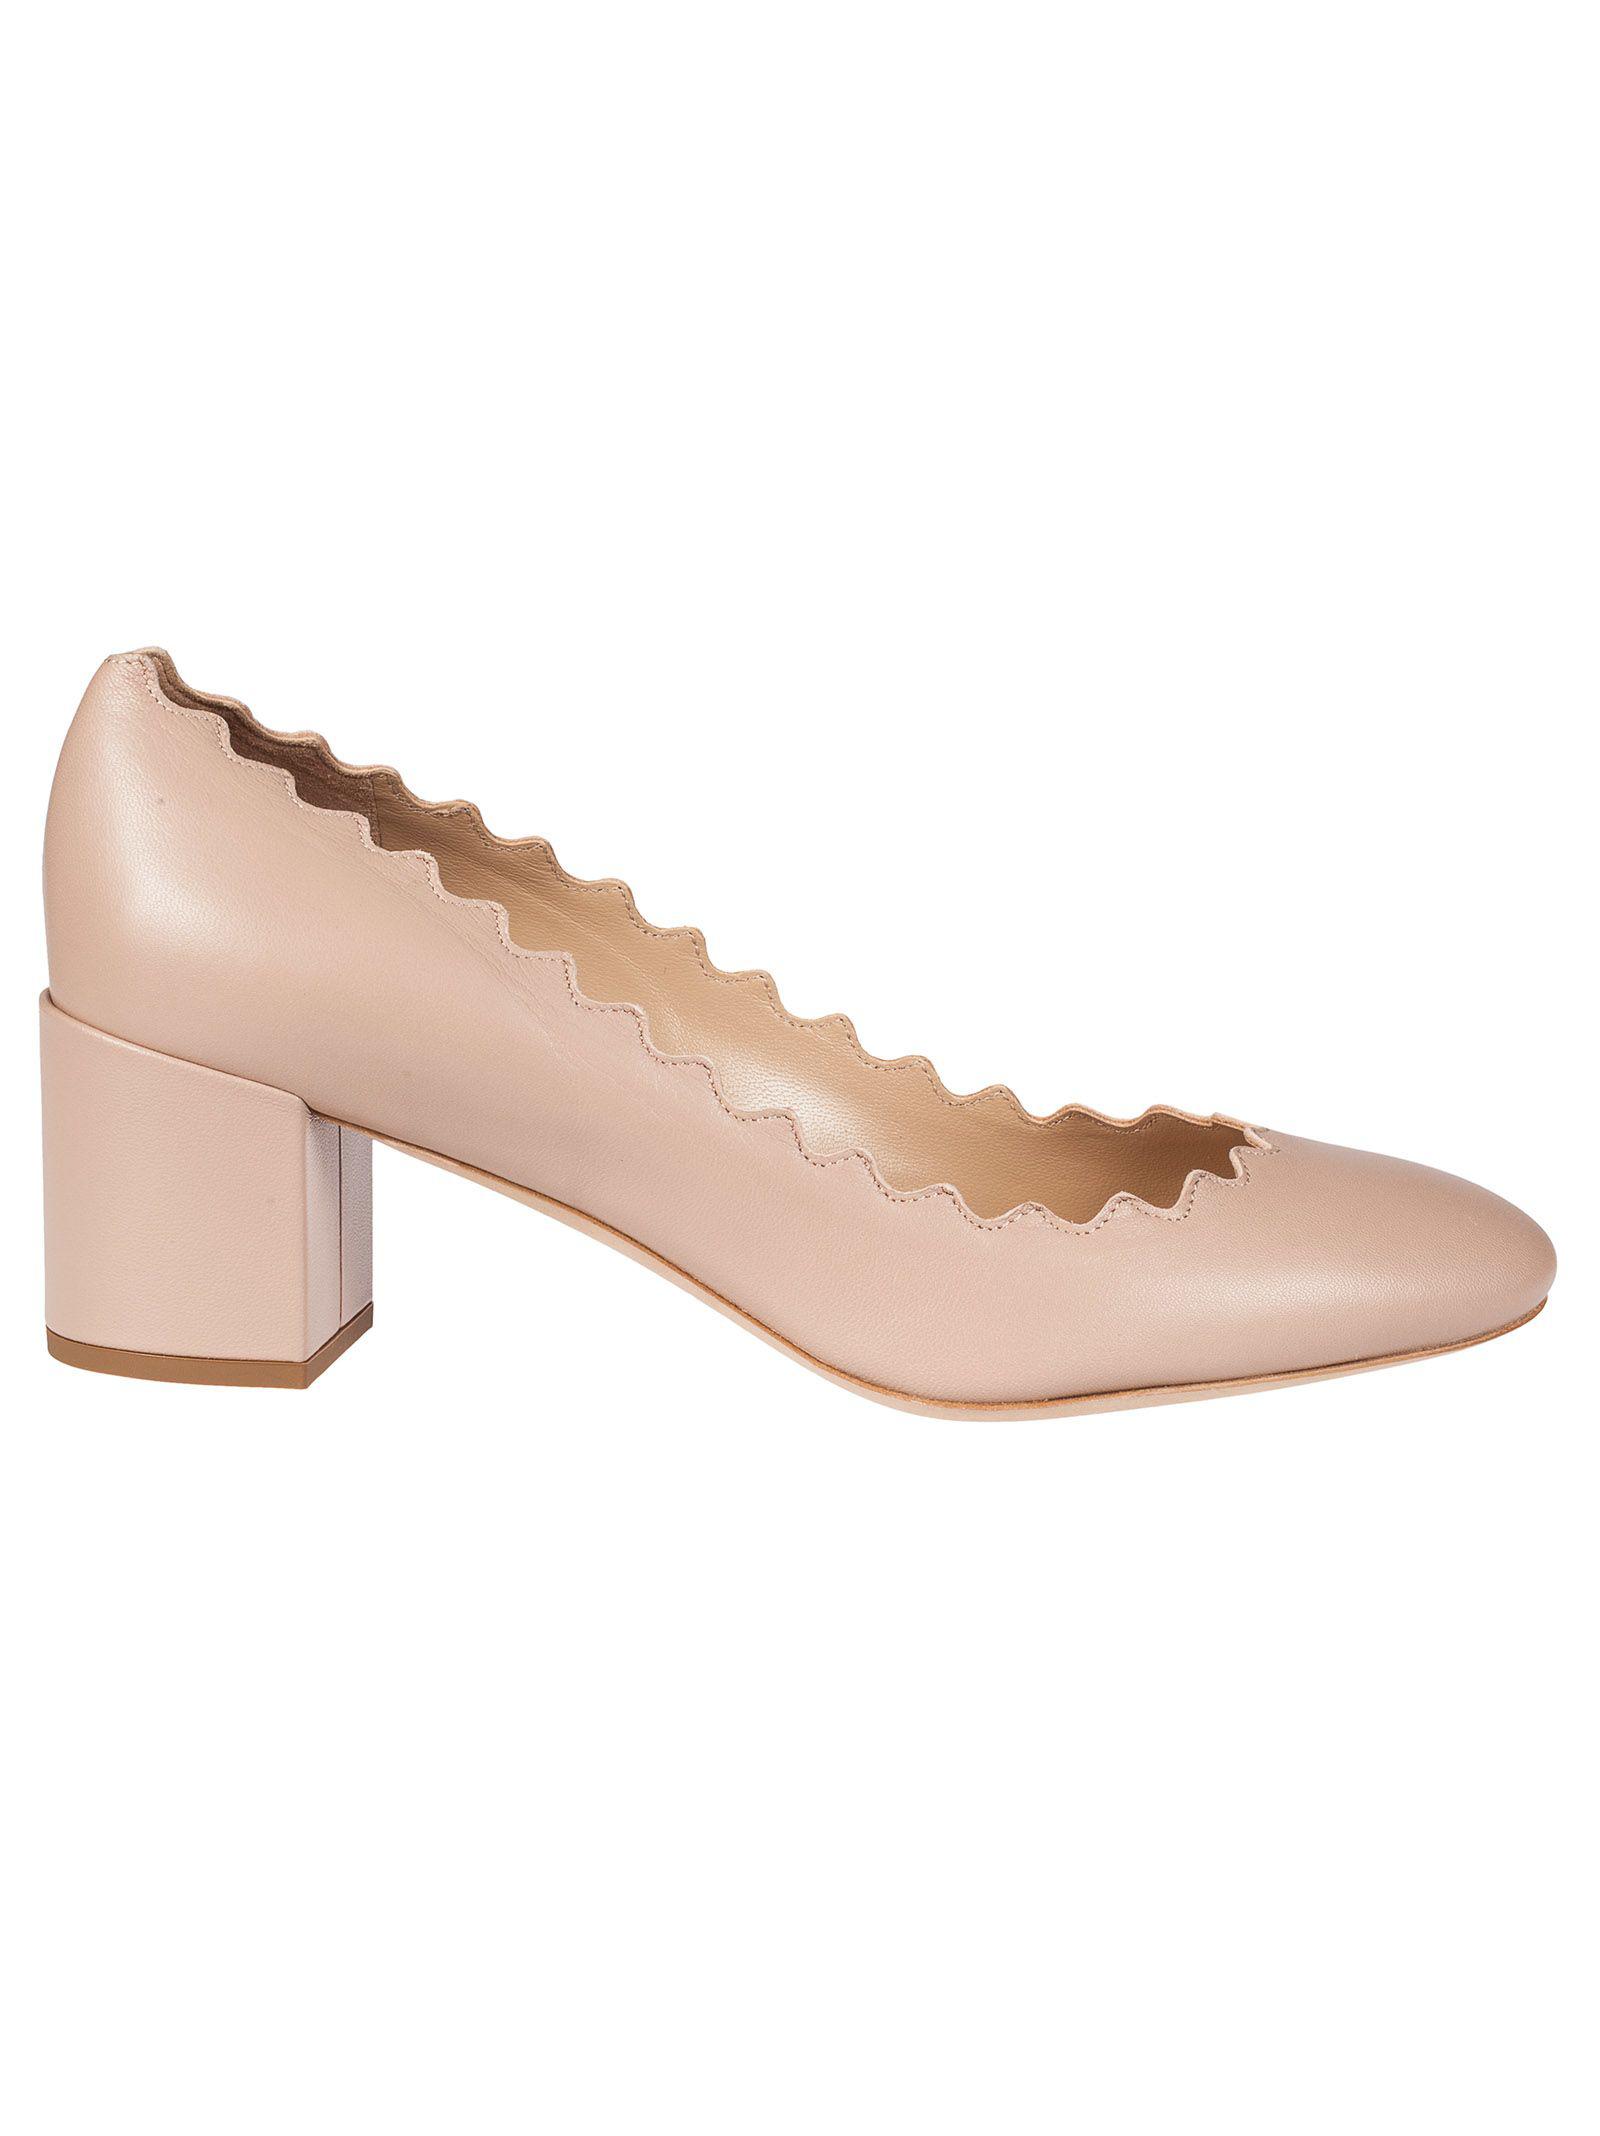 ceed6d8d9 ChloÉ Women's Lauren Scalloped Block-Heel Pumps In Neutral   ModeSens